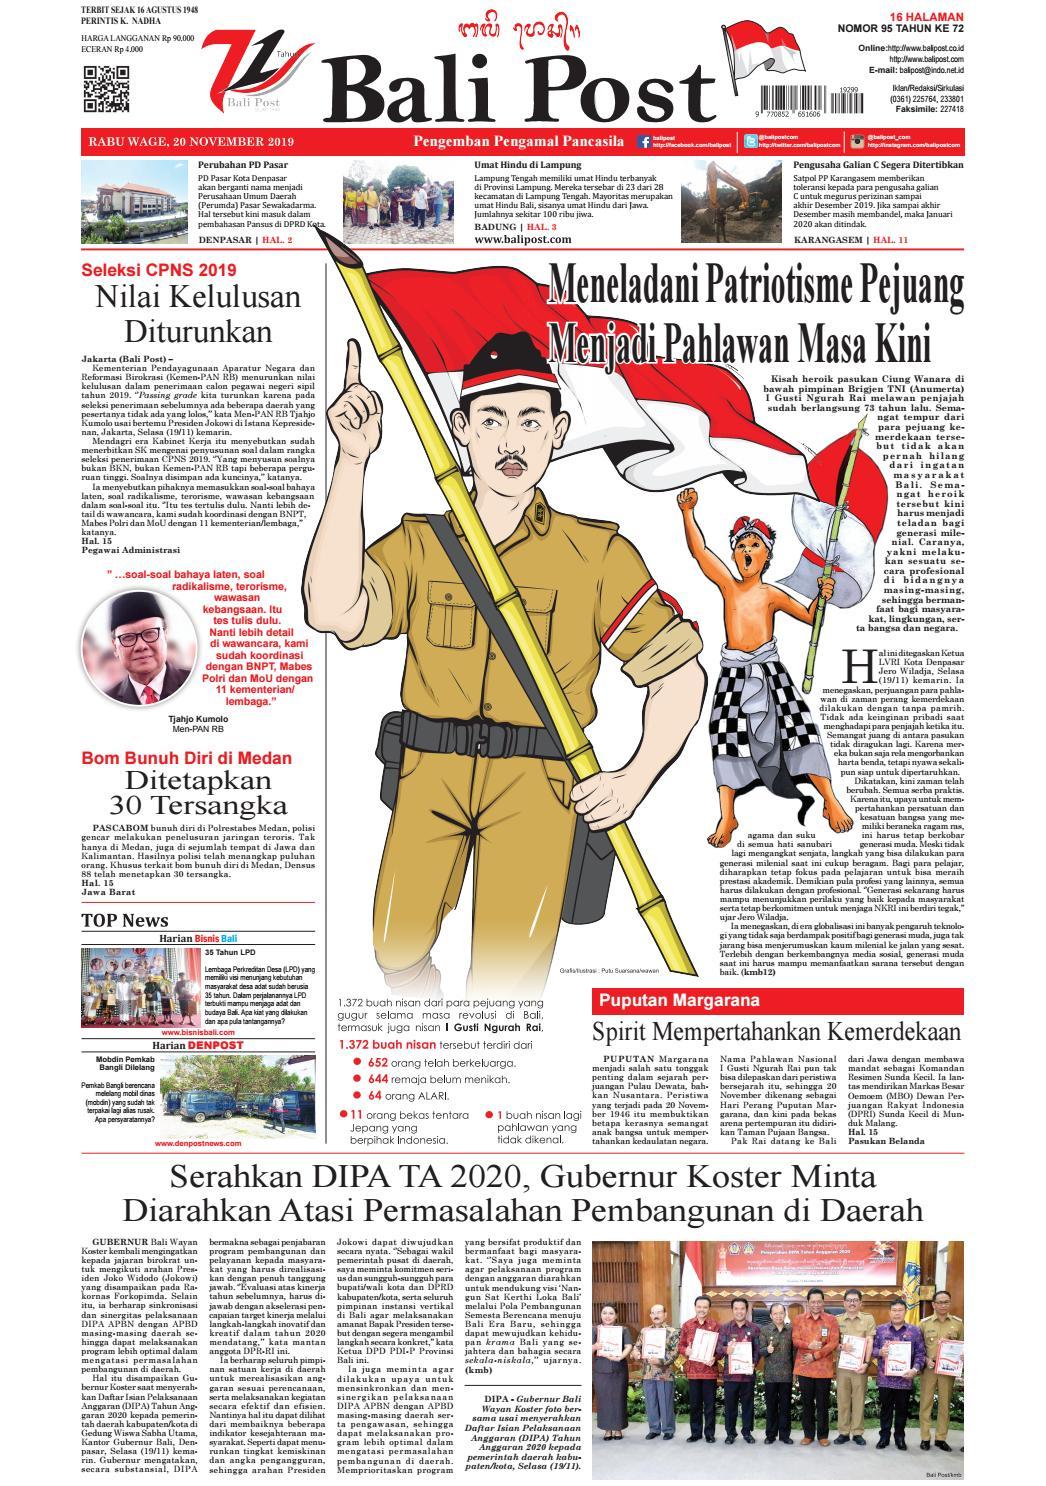 Edisi Rabu 20 Nopember 2019 Balipost Com By E Paper Kmb Issuu